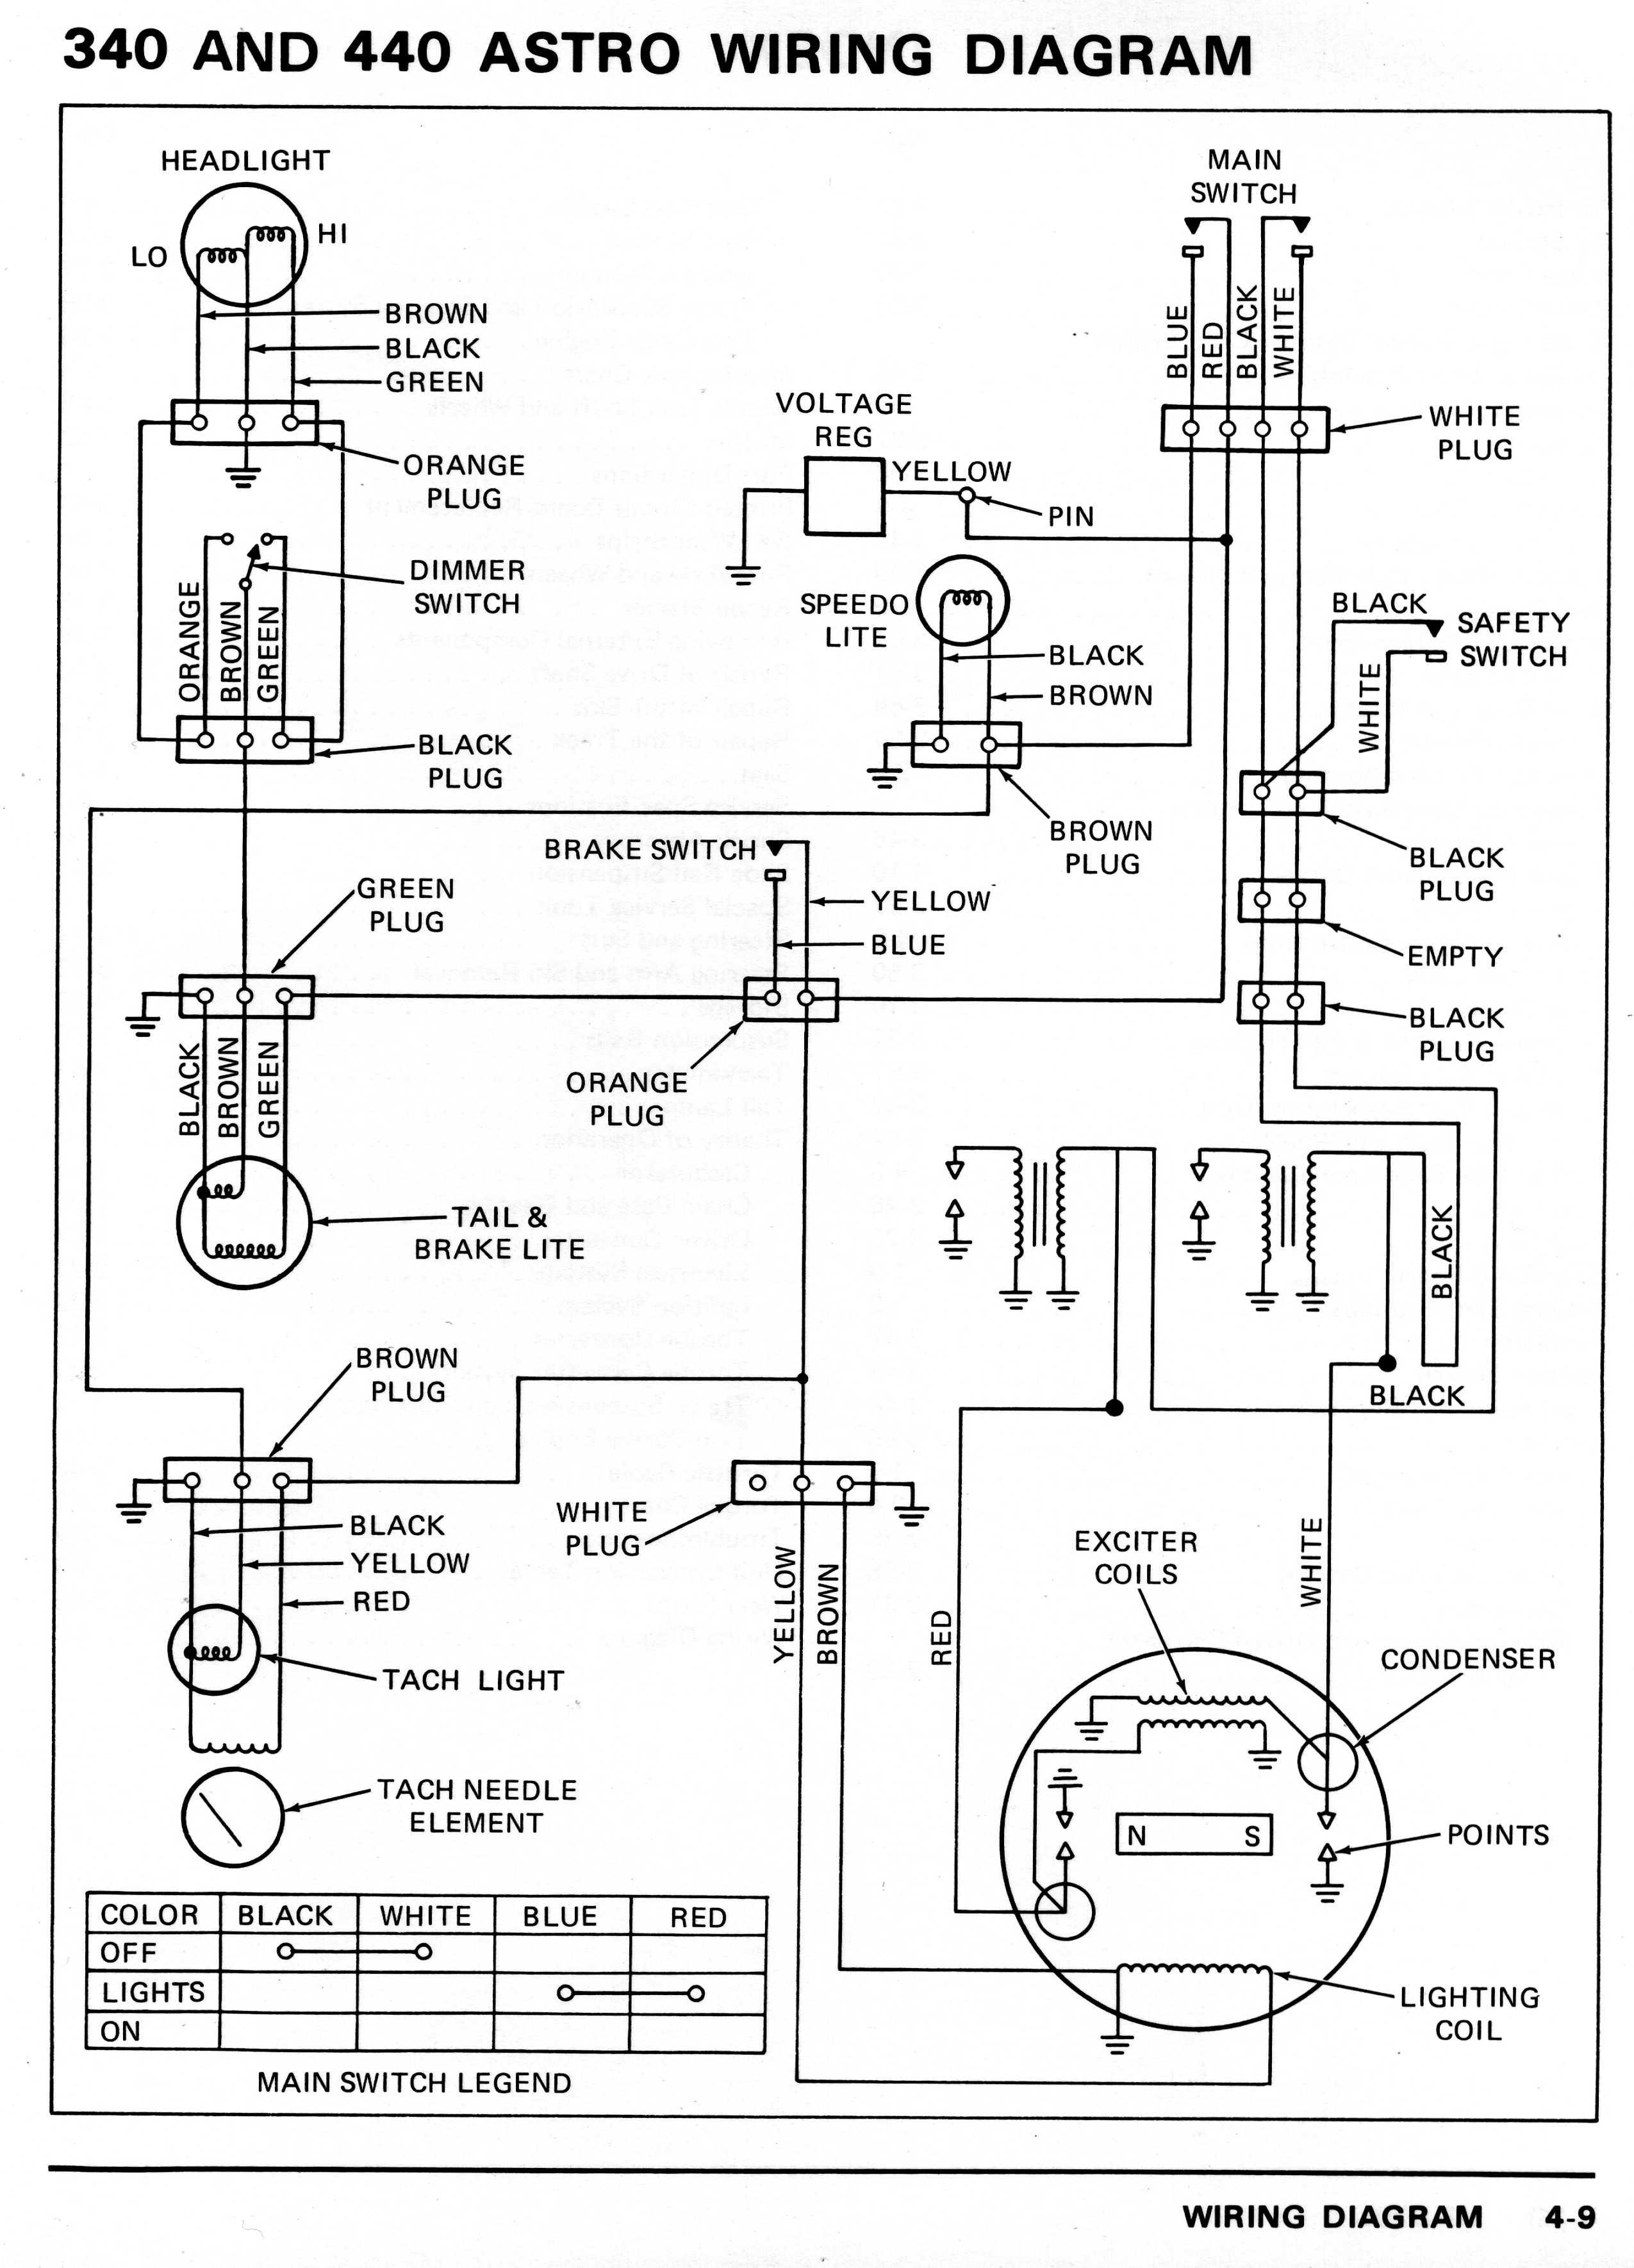 Kawasaki Astro Sa340 440 A1 Wiring Diagrams